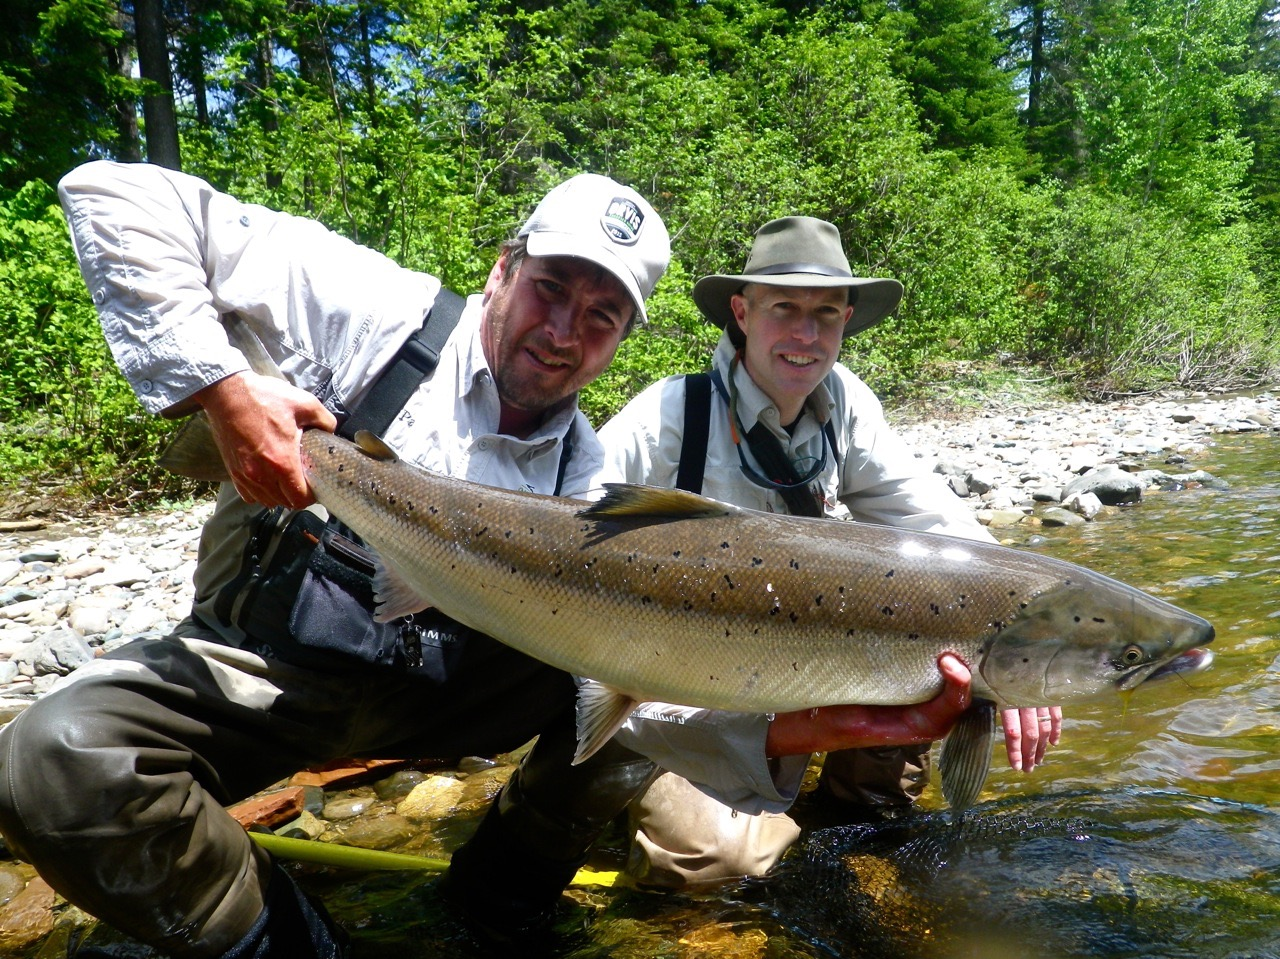 Salmon Lodge regular Brian Spence with Salmon Lodge guide Pat Trudel. A fineGrand Cascapedia beauty!, Congratulations Brian!